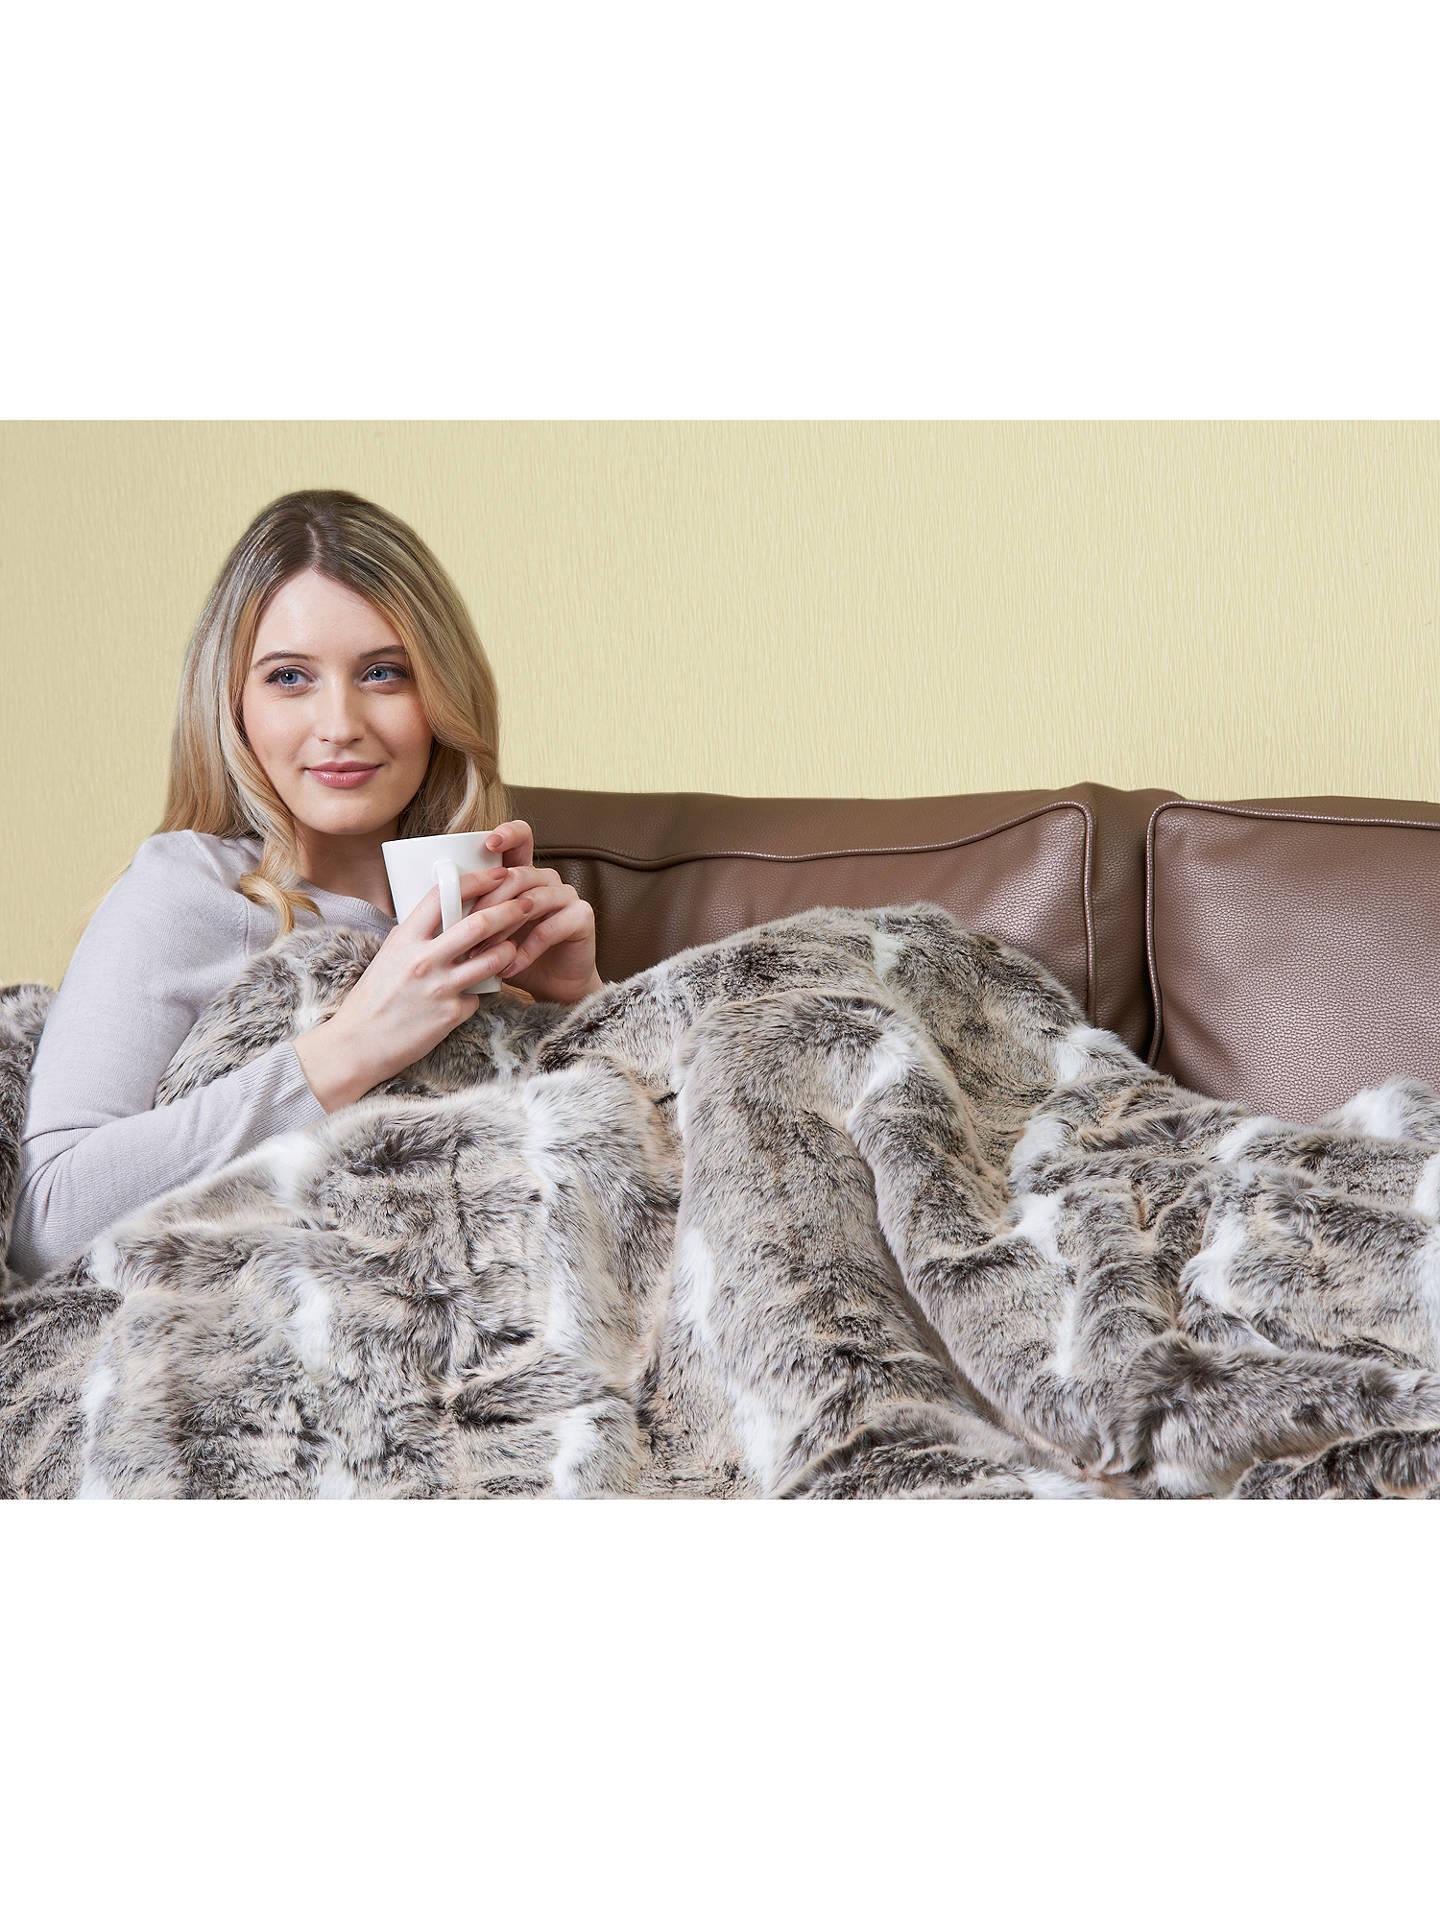 Dreamland 16340 Faux Fur Throw Heated Electric Blanket